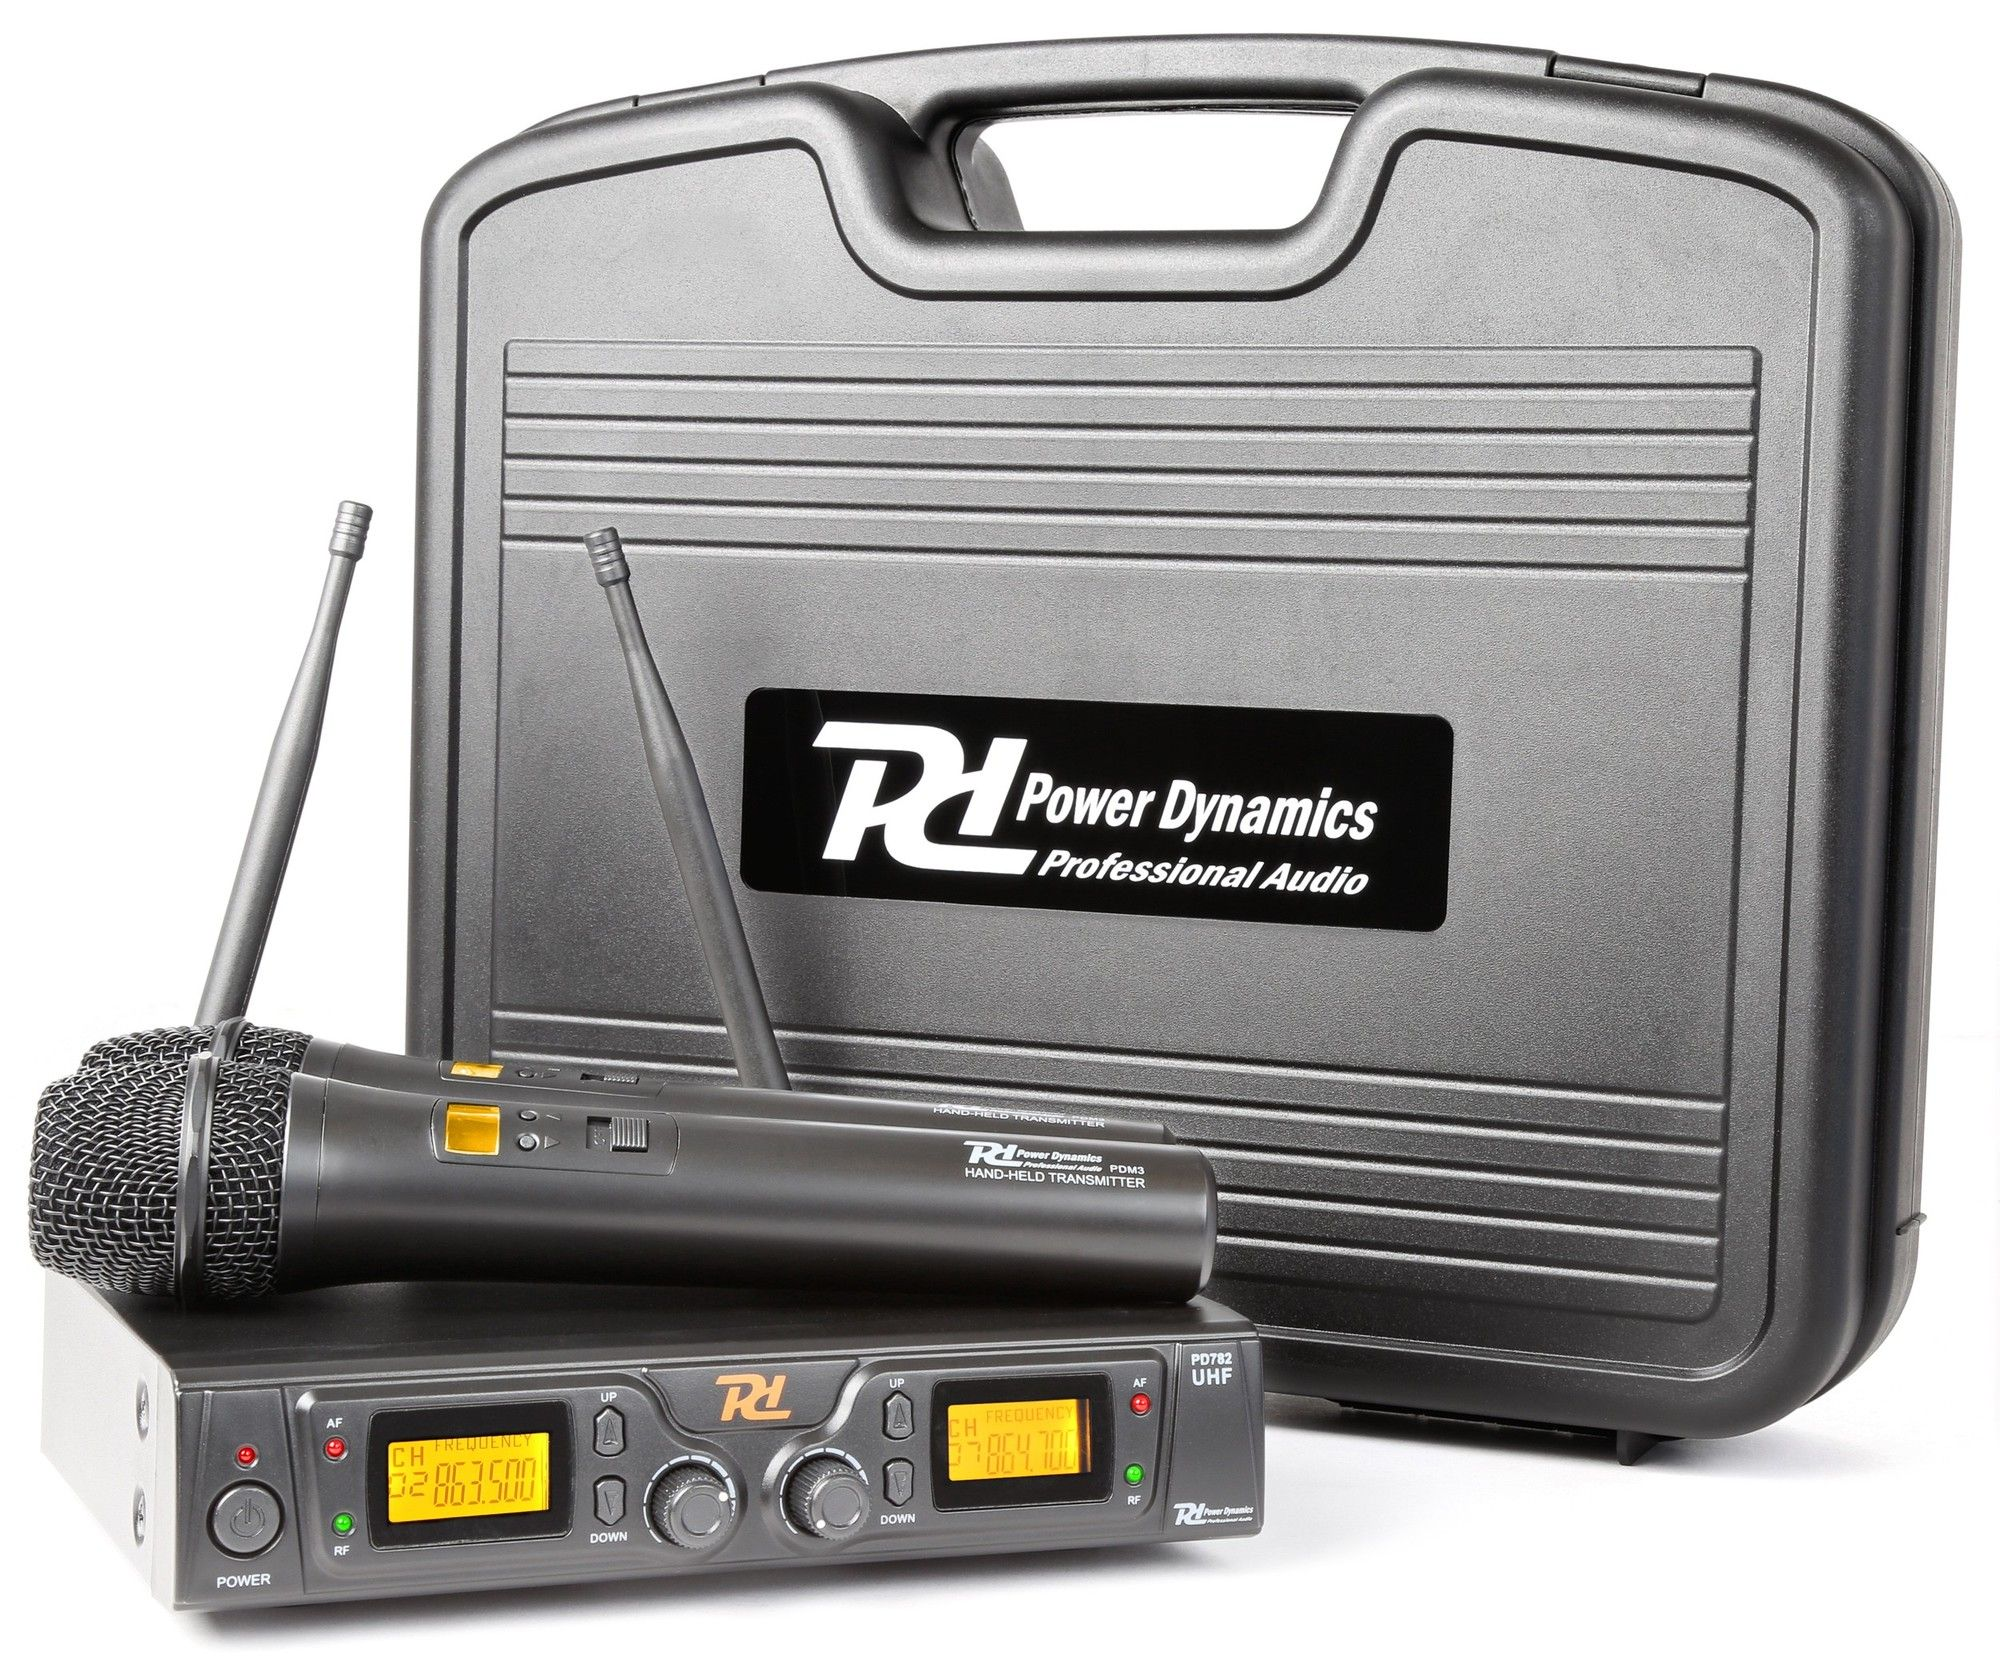 Afbeelding van Power Dynamics PD782 (UHF) Draadloos microfoonsysteem duo...